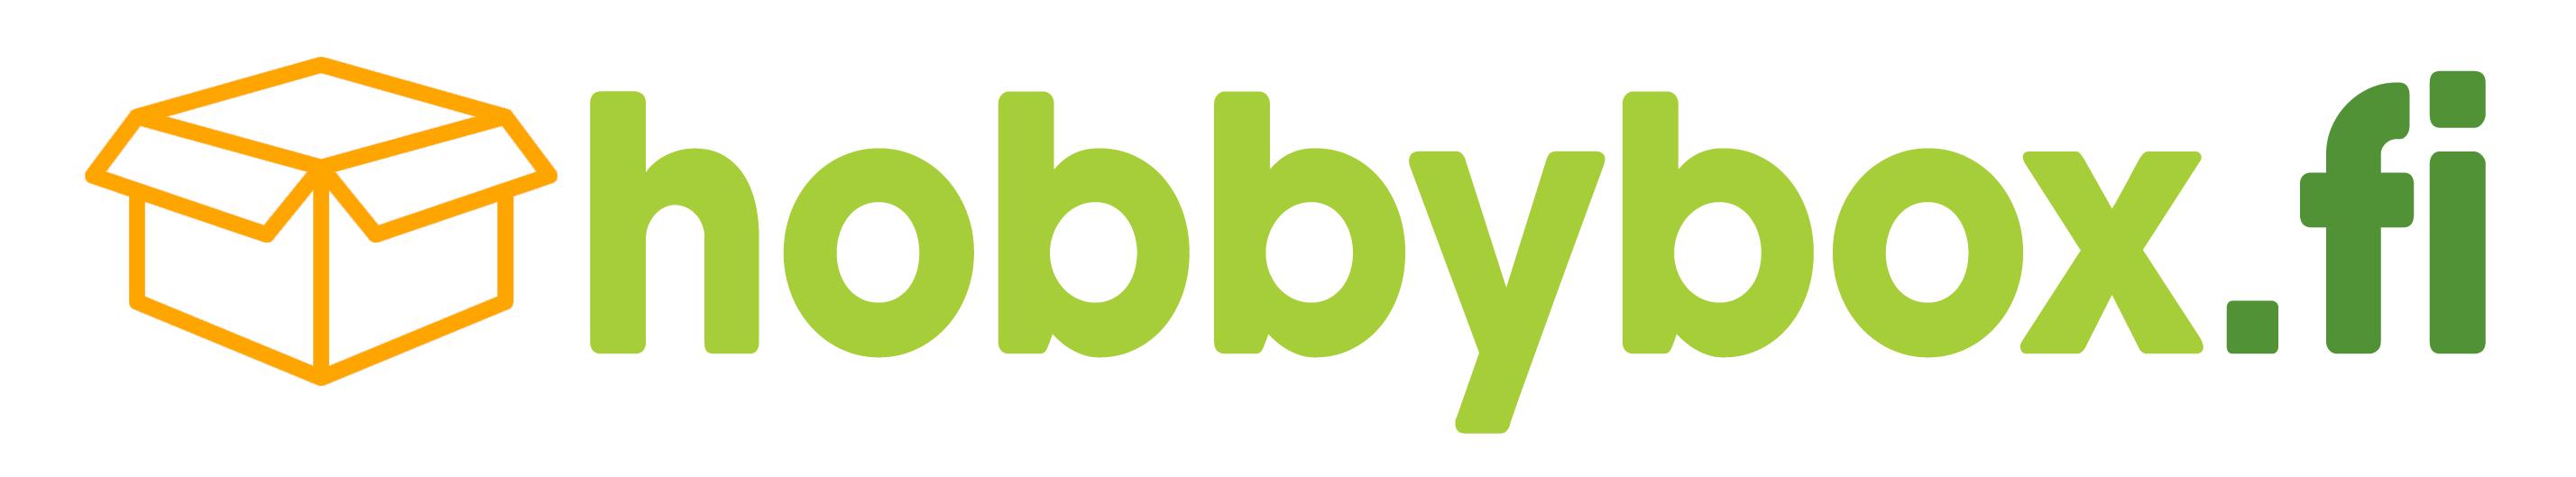 hobbybox logo